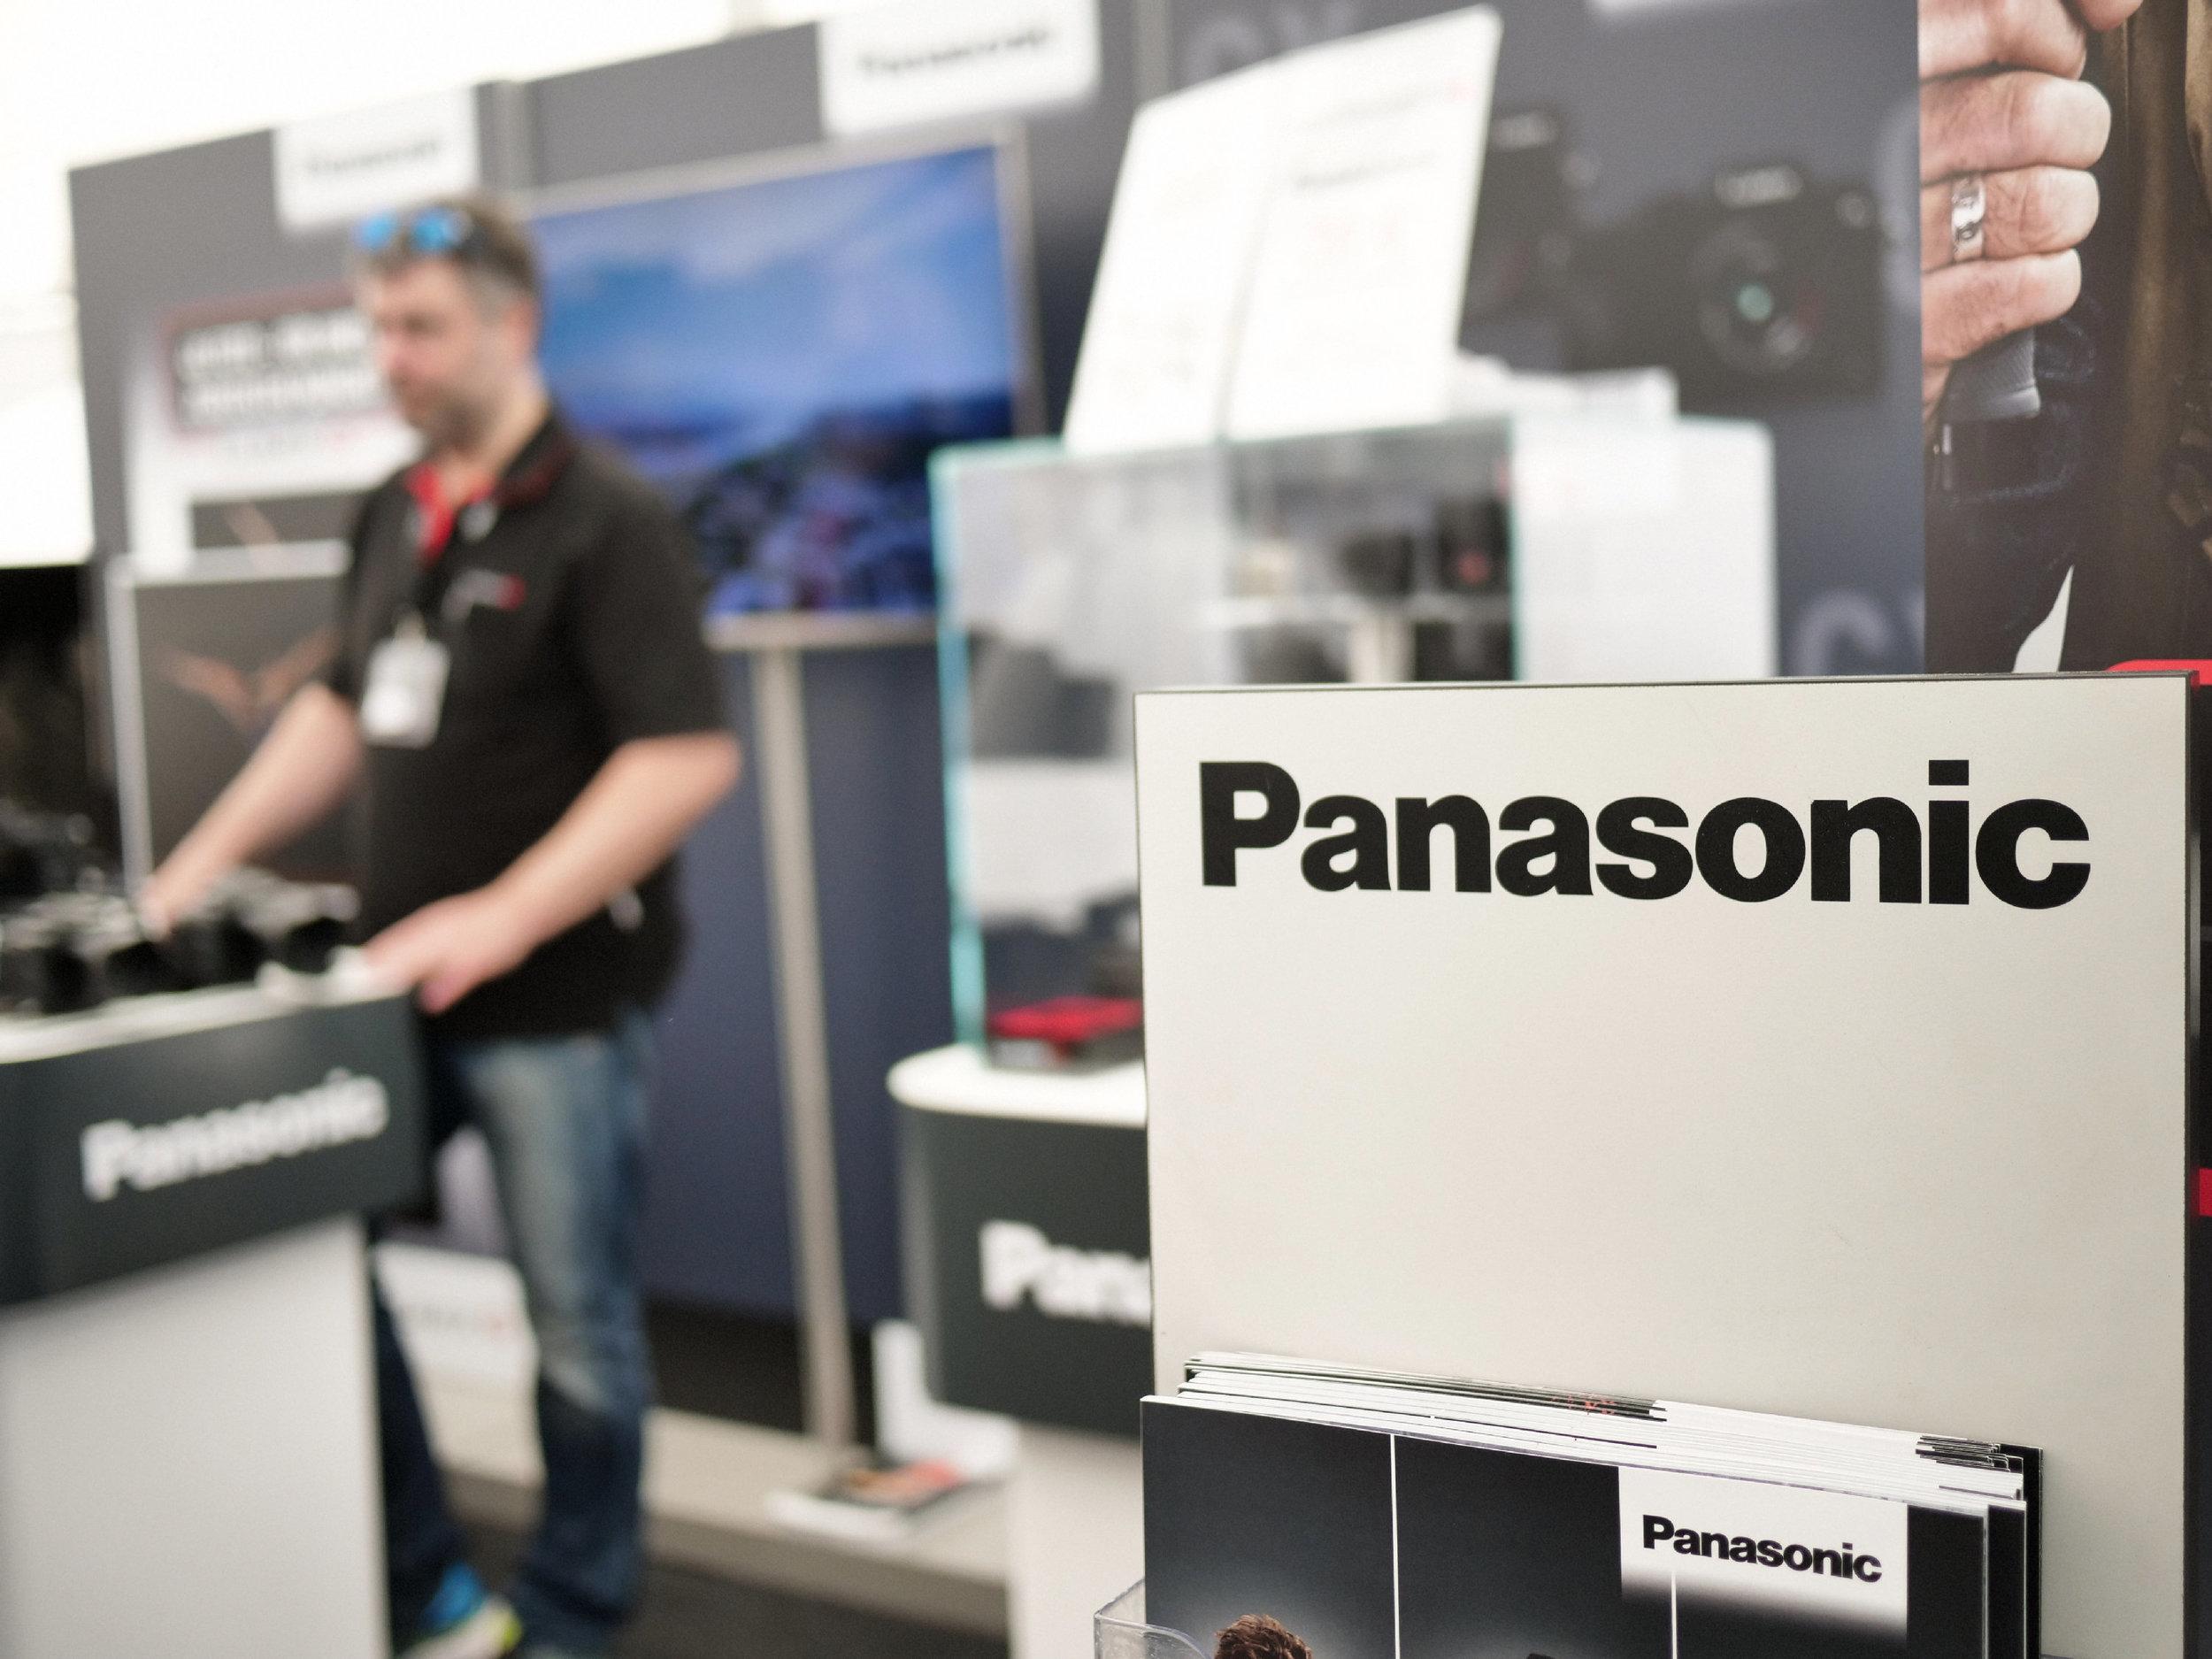 P1000235_Exp2_Panasonic Lumix Workshop.jpg